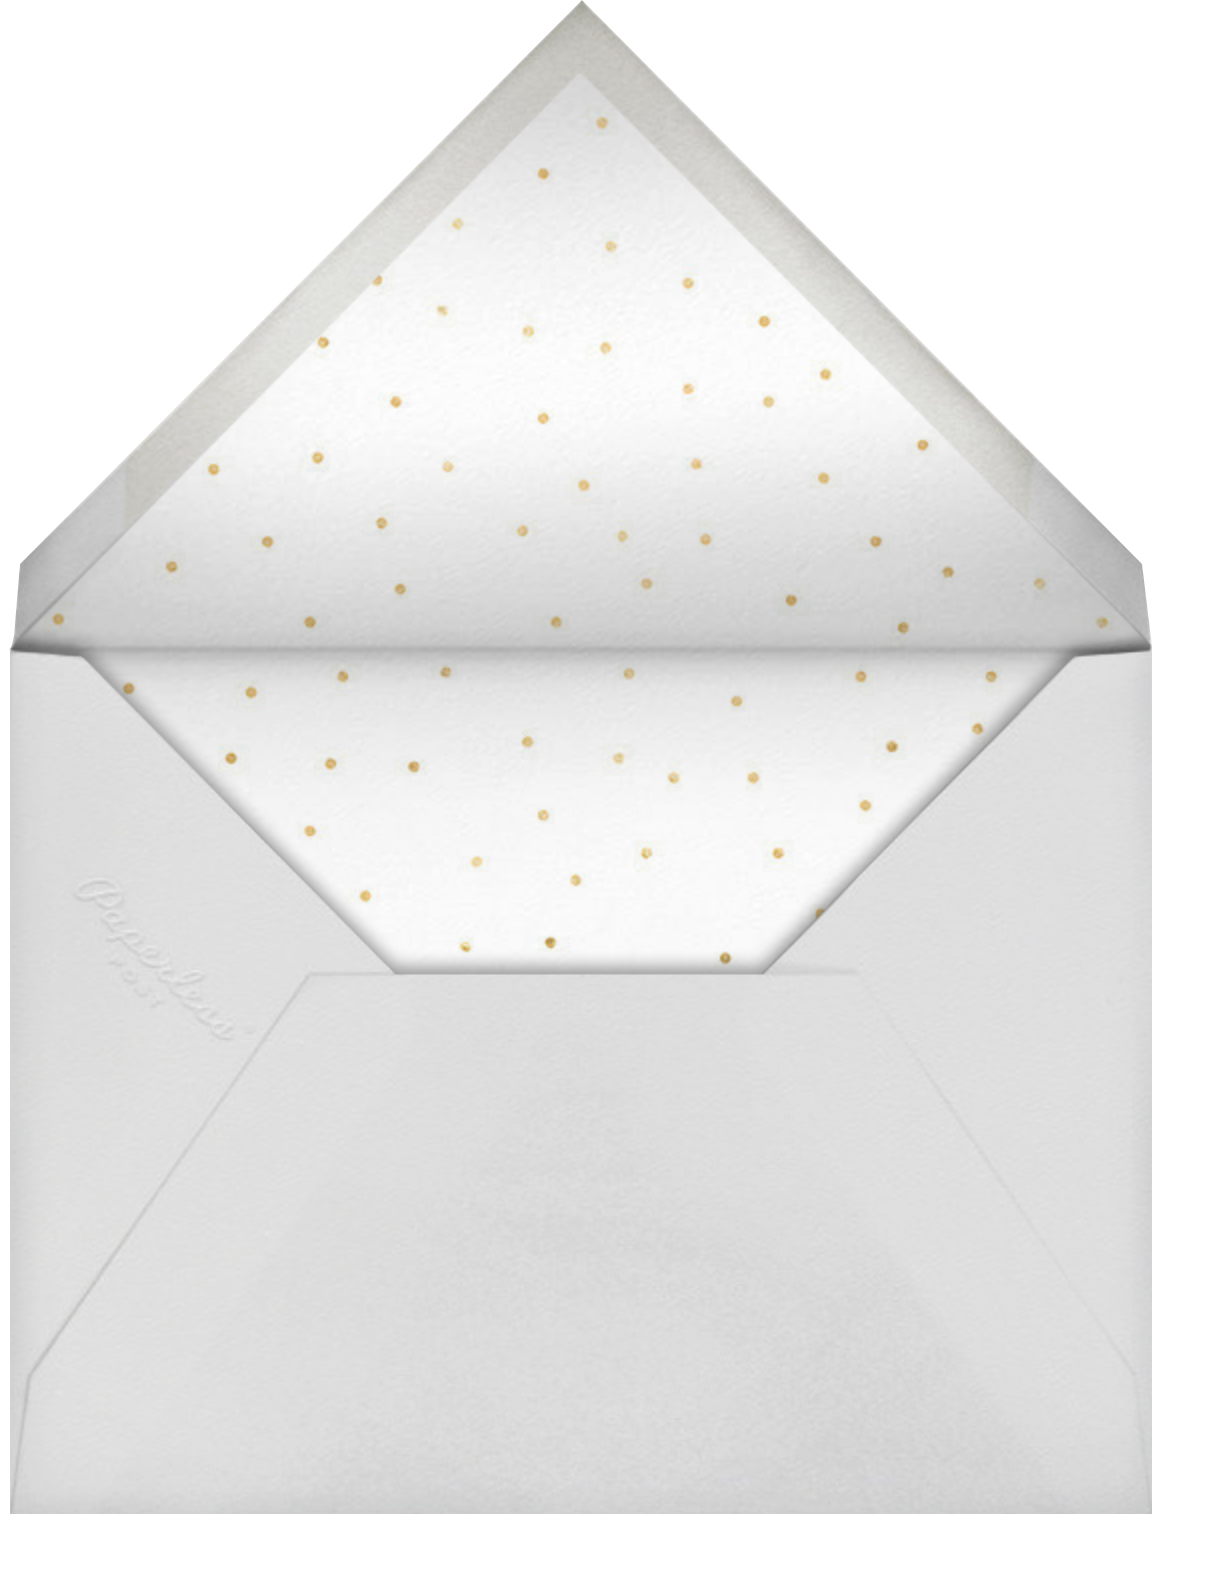 Stripe Border - Peacock - Paperless Post - Breonna Taylor birthday cards - envelope back